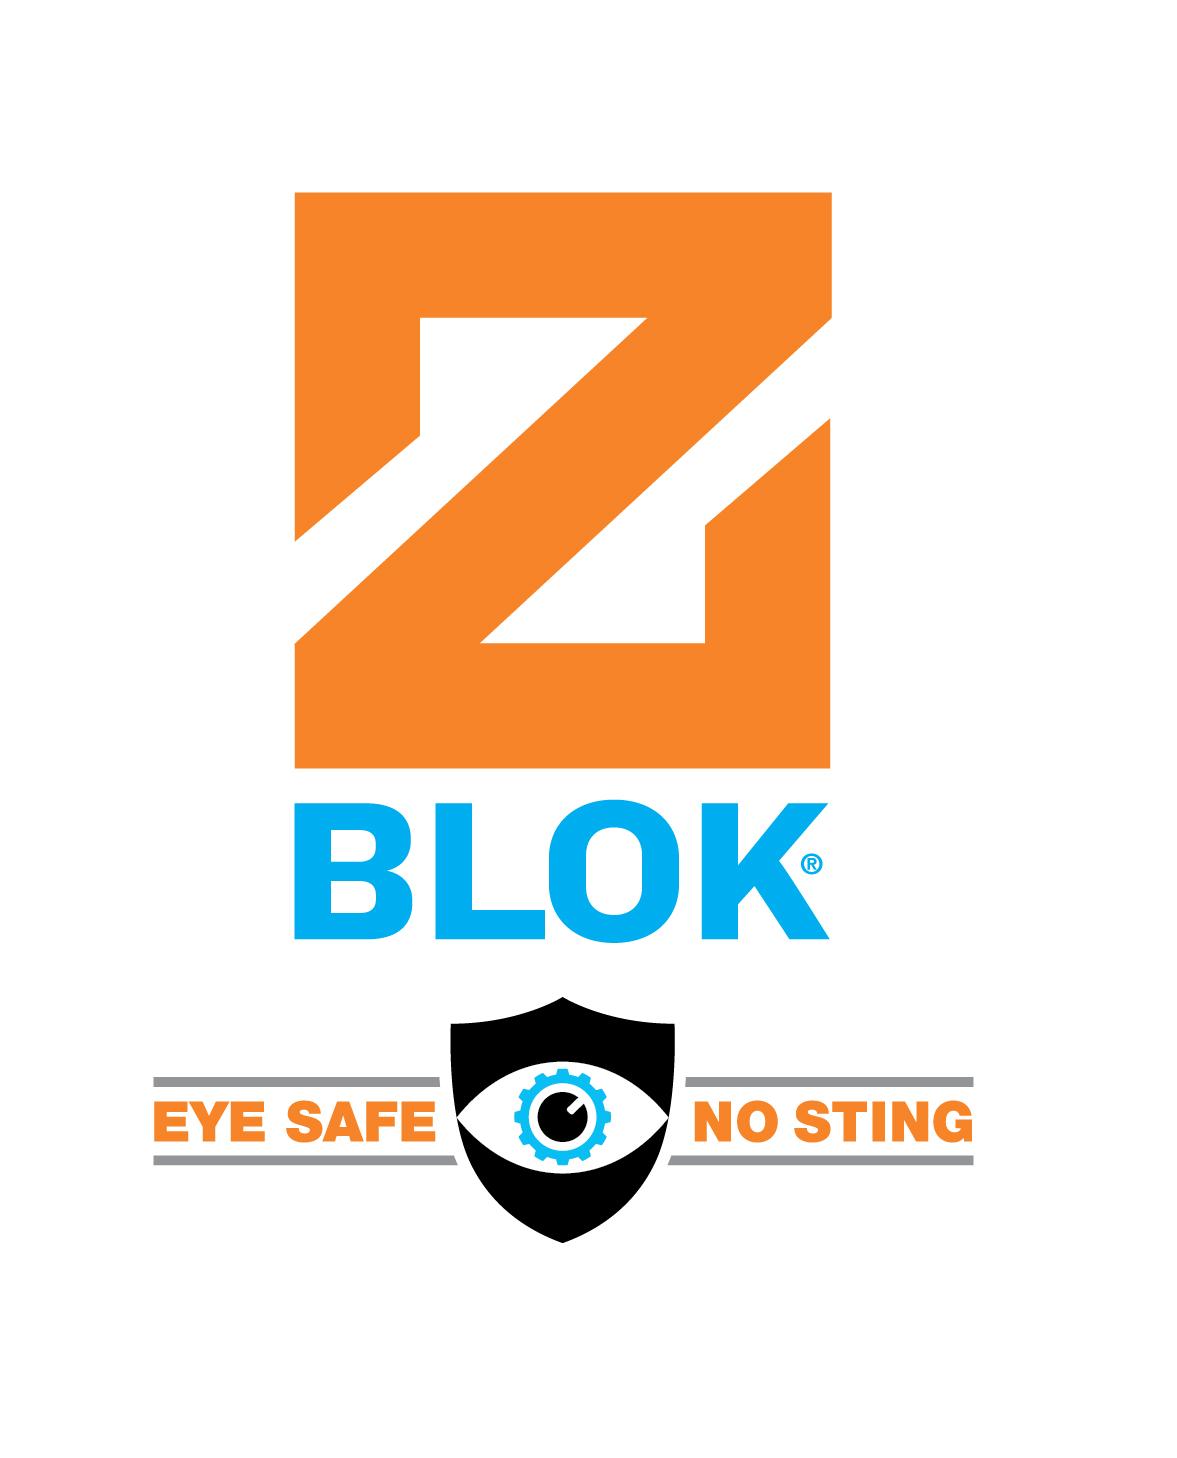 Zblok_Eyesafe.jpg